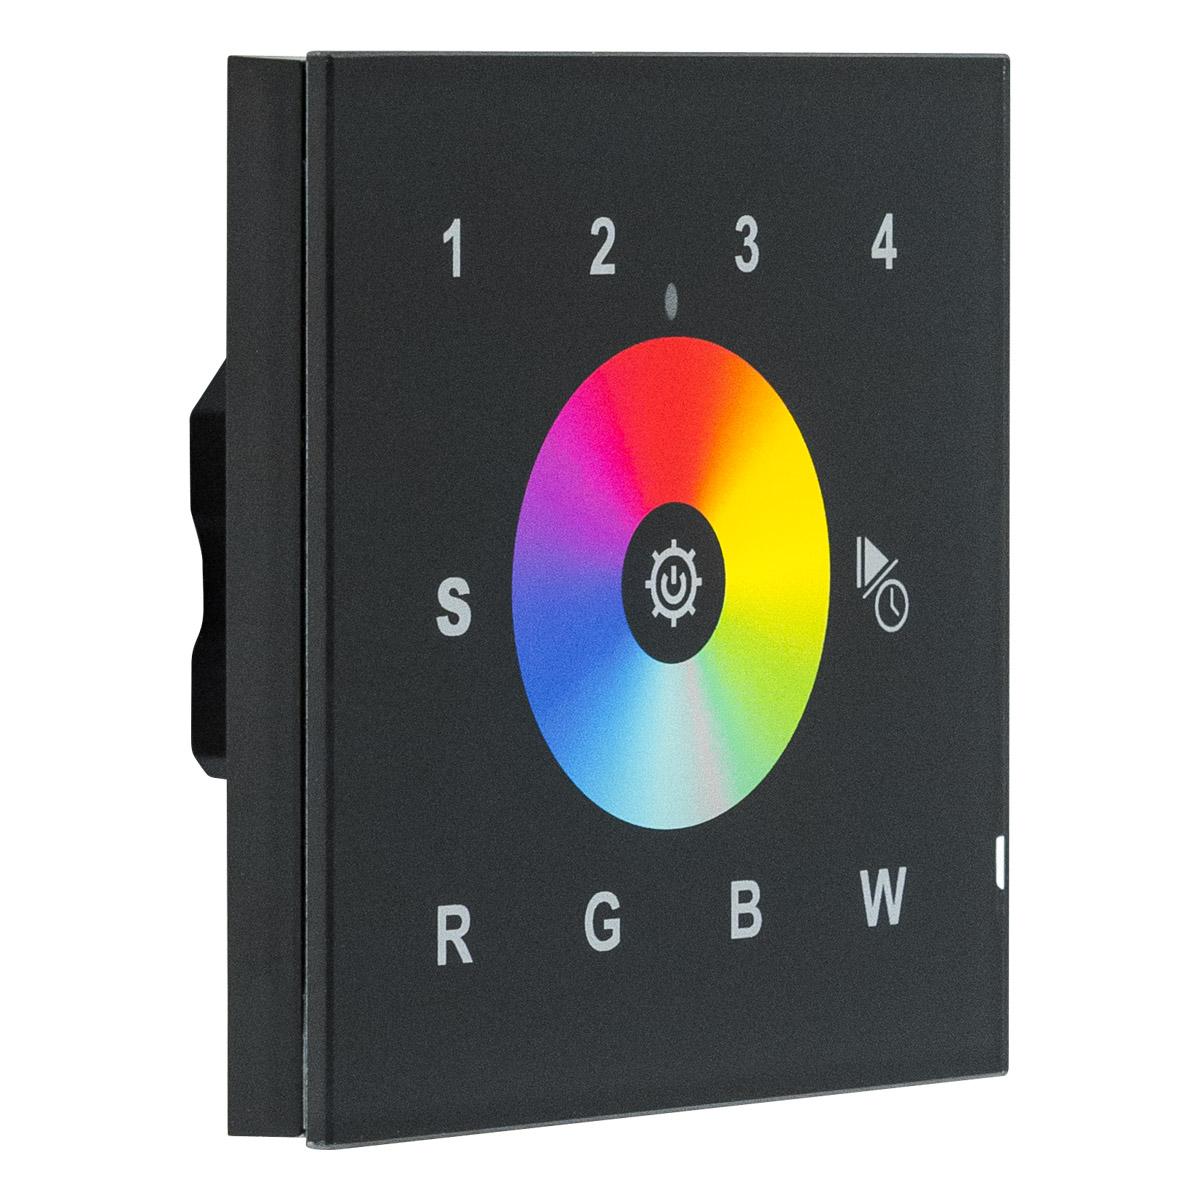 wifi wandpanel rgb w schwarz 230v ac. Black Bedroom Furniture Sets. Home Design Ideas